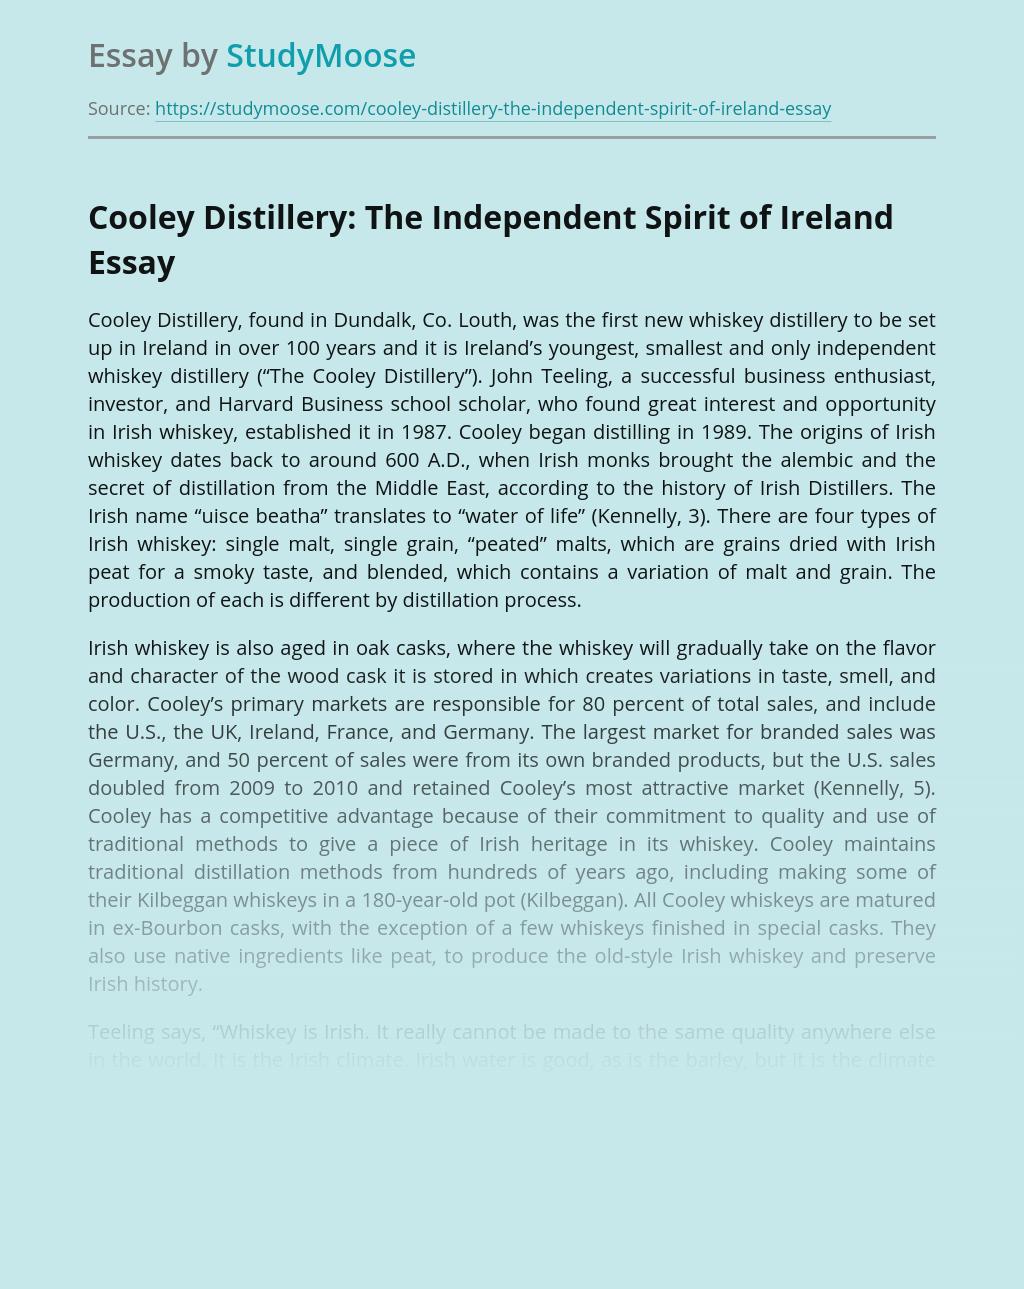 Cooley Distillery: The Independent Spirit of Ireland